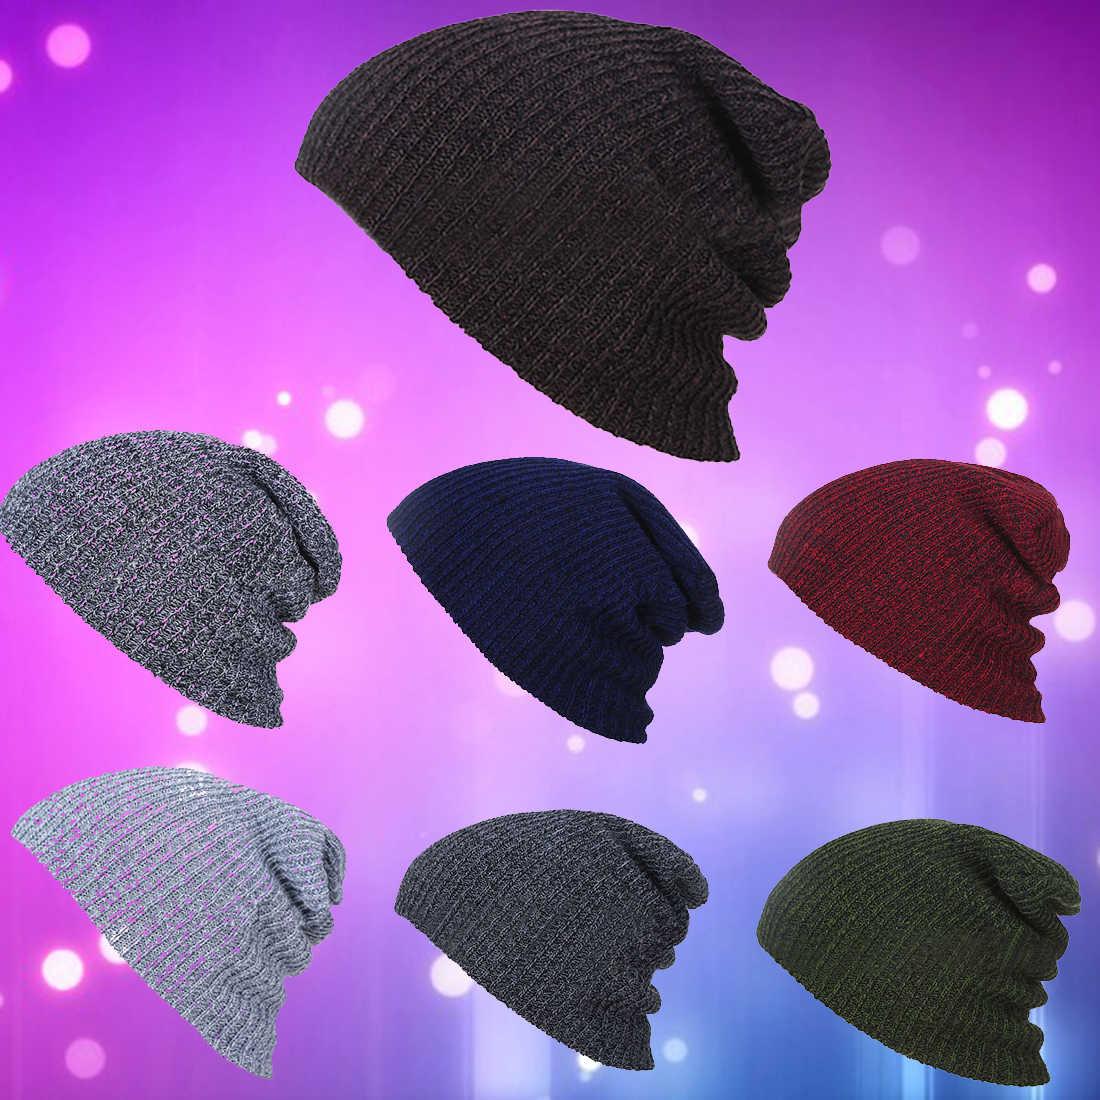 320645a7709 ... Hot Knit Men s Baggy Beanie Oversize Winter Warm Hats Slouchy Chic  Crochet Knitted Cap For Women ...